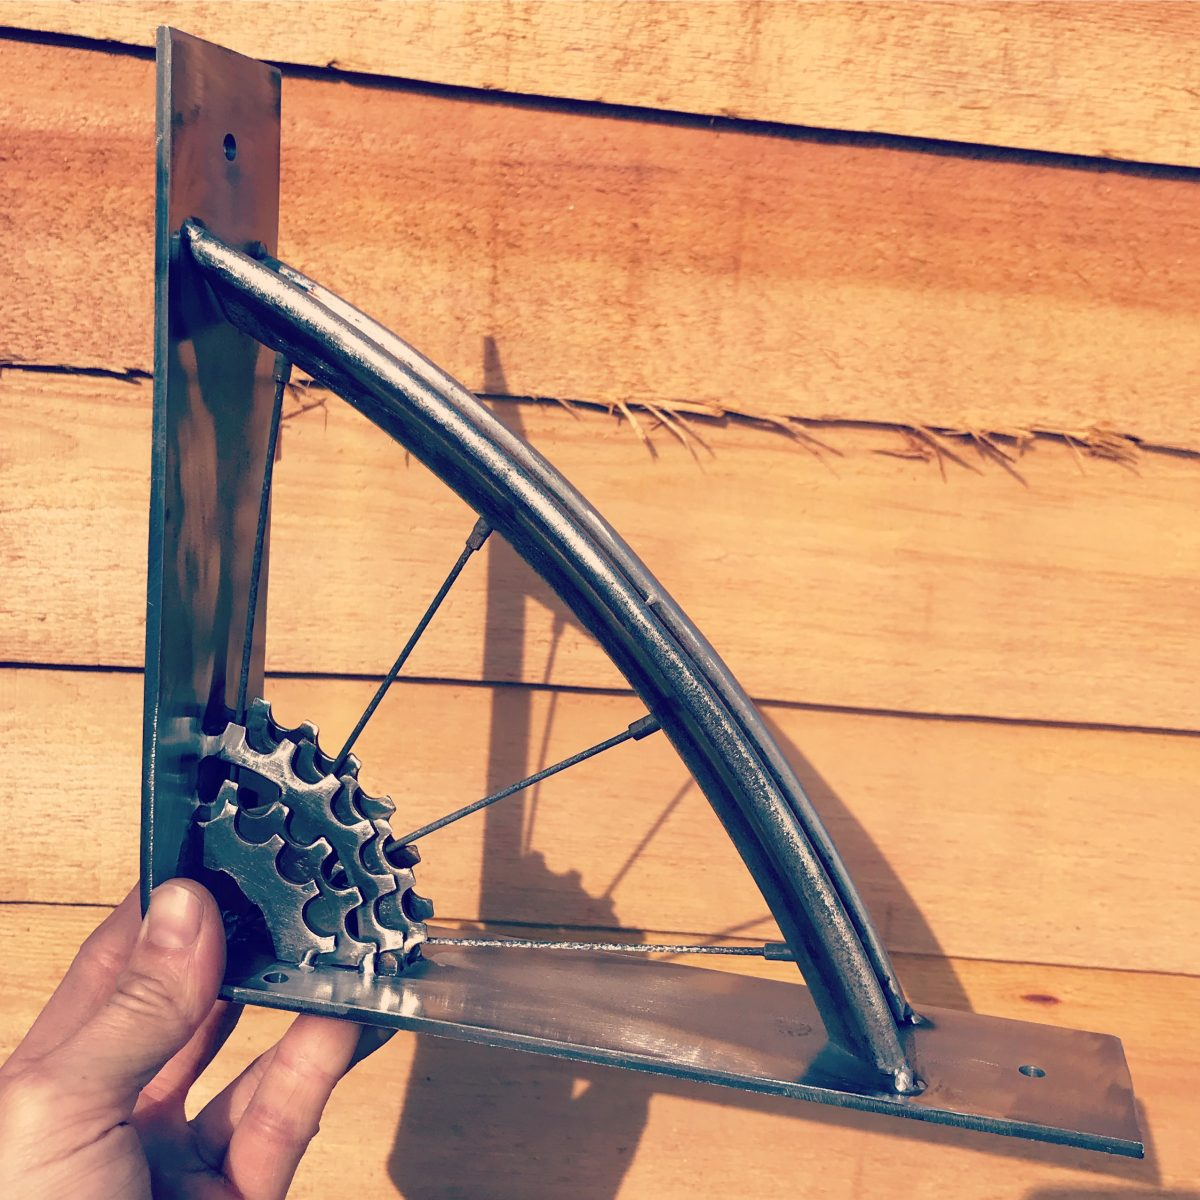 Handmade shelves shelf bracket from salvaged bike parts